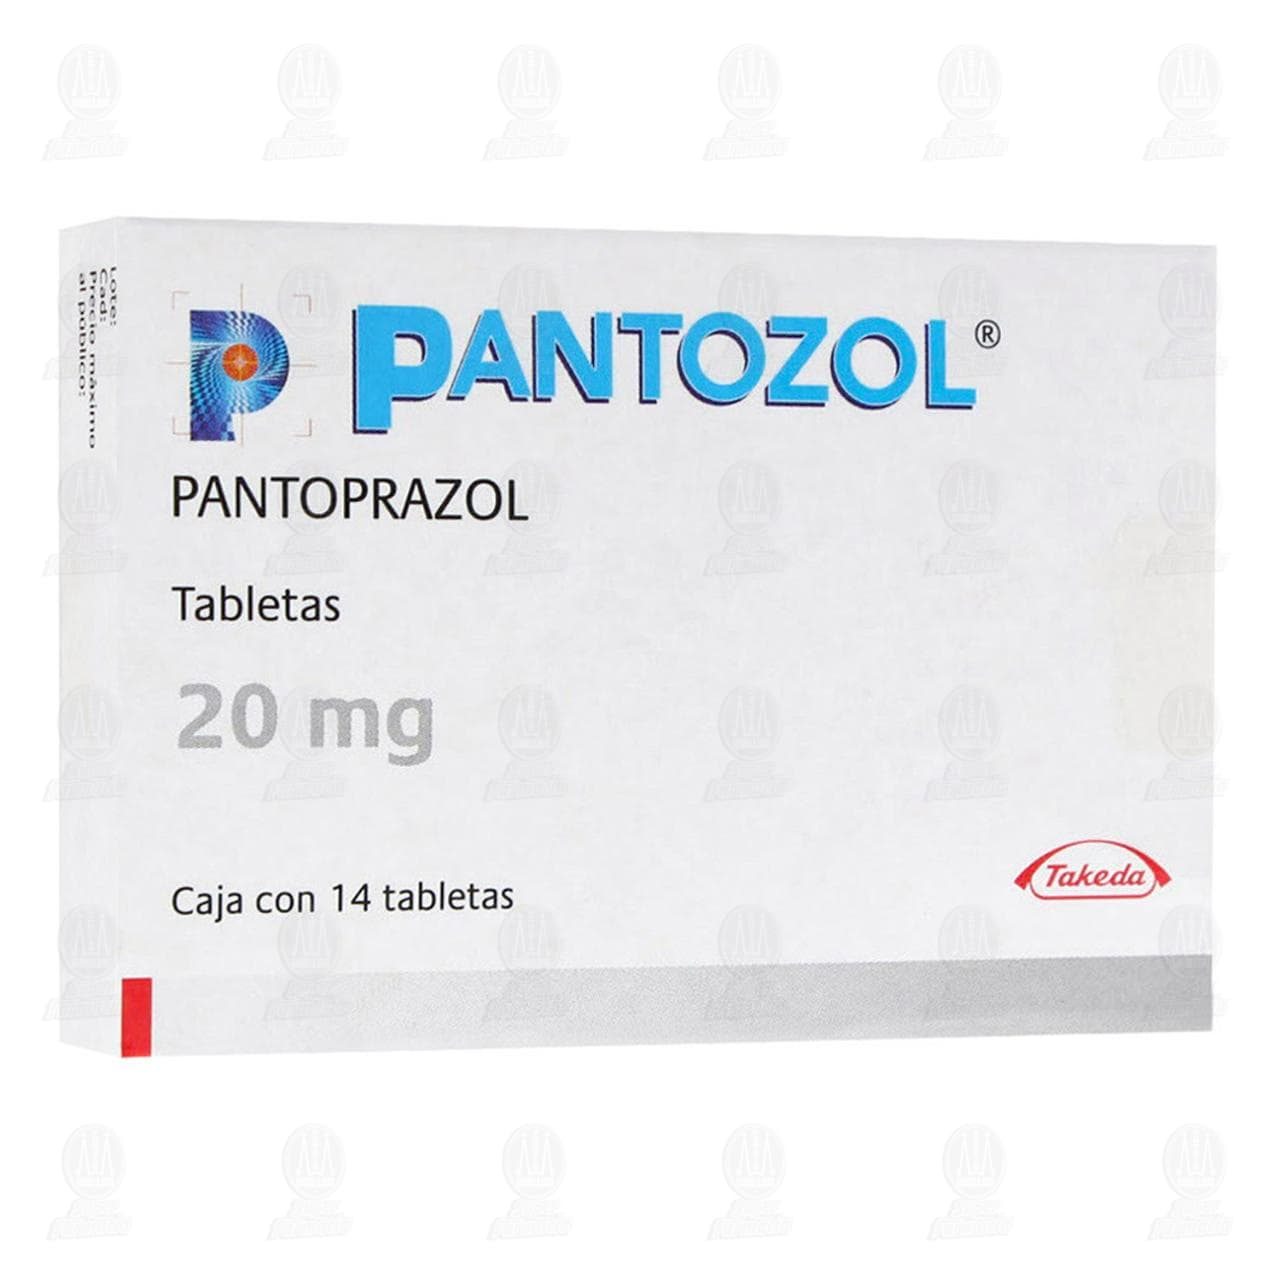 Comprar Pantozol 20mg 14 Tabletas en Farmacias Guadalajara